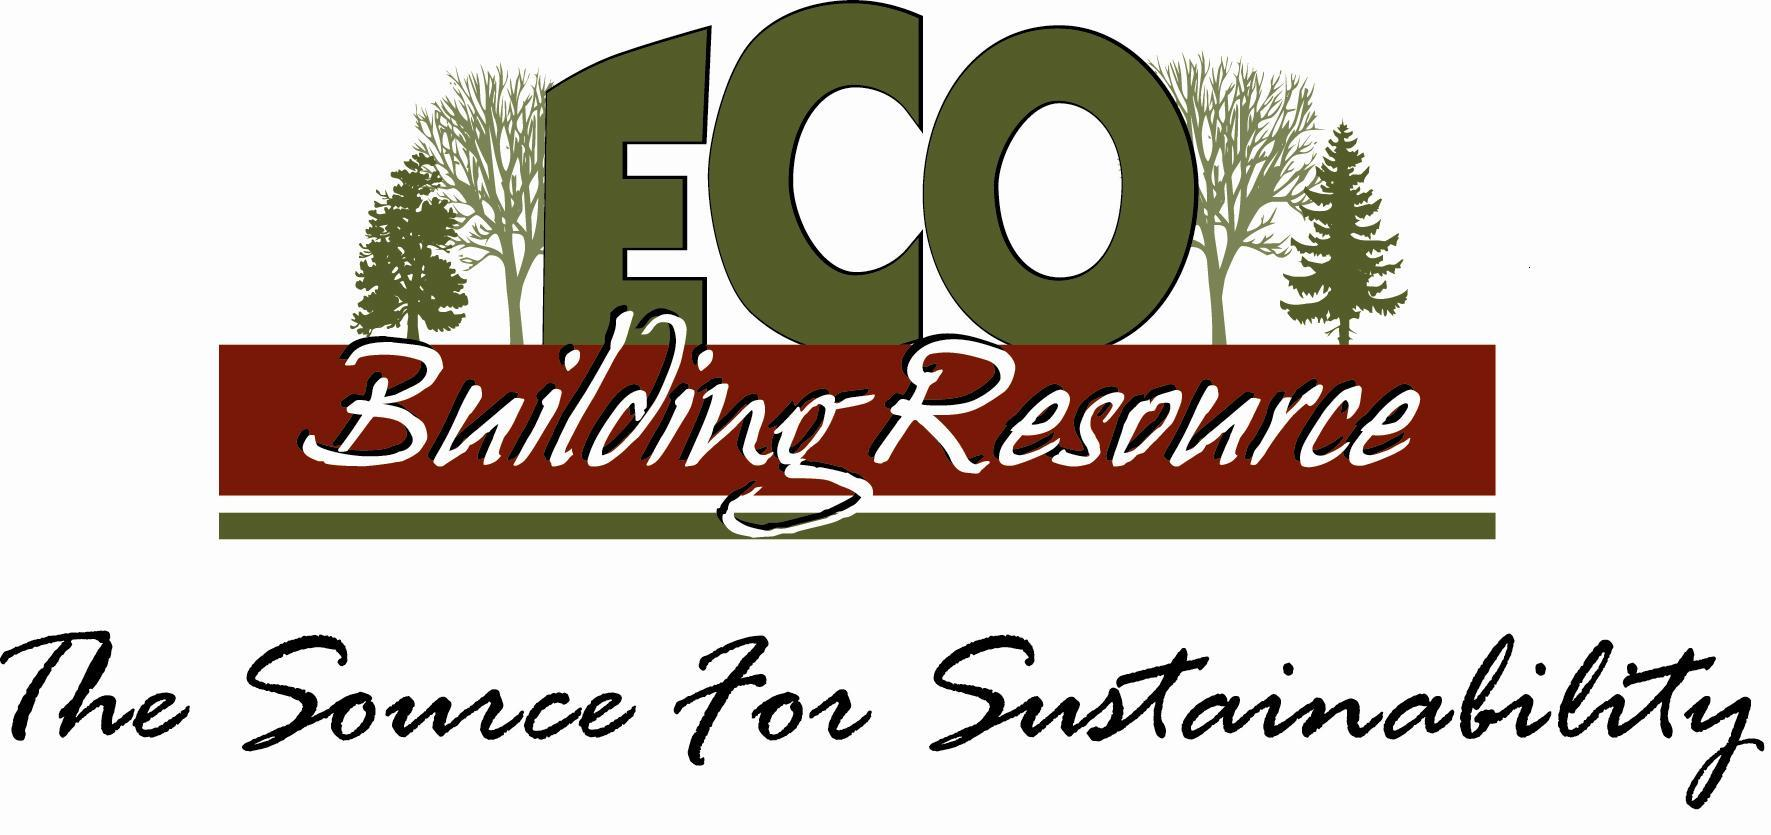 Eco Building Resource Logo